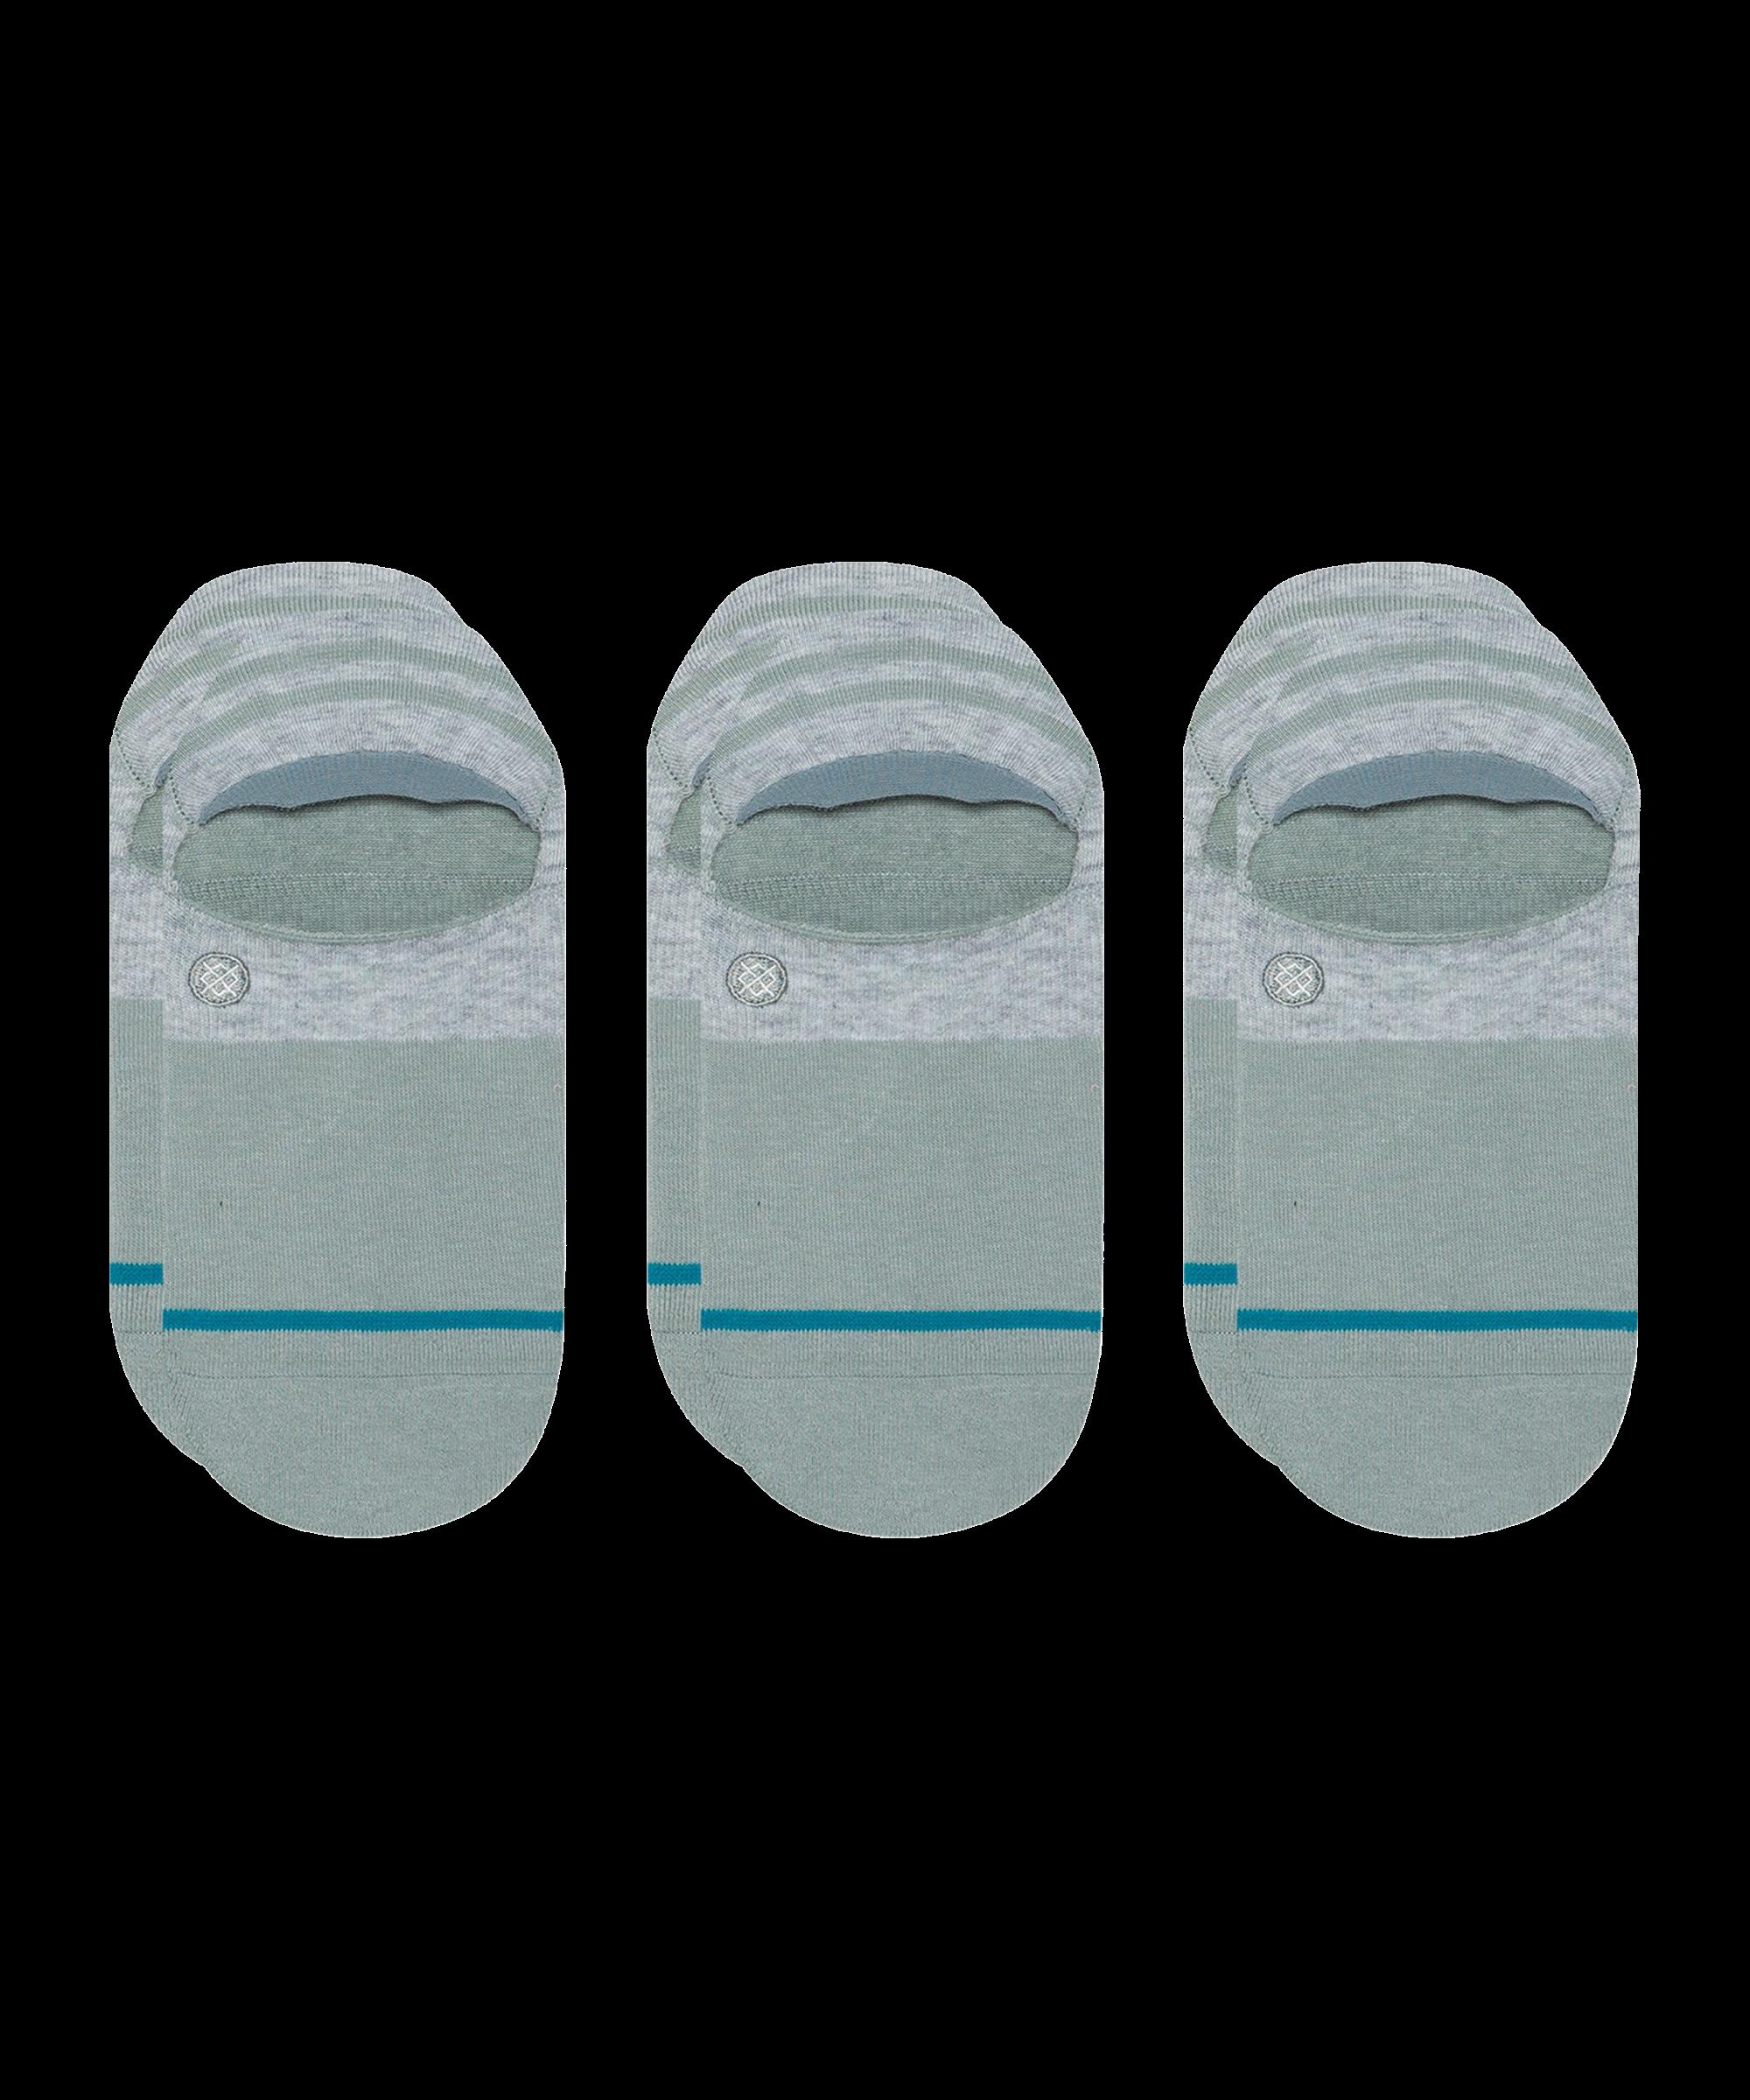 Stance Uncommon Gamut II Socks 3 Pack